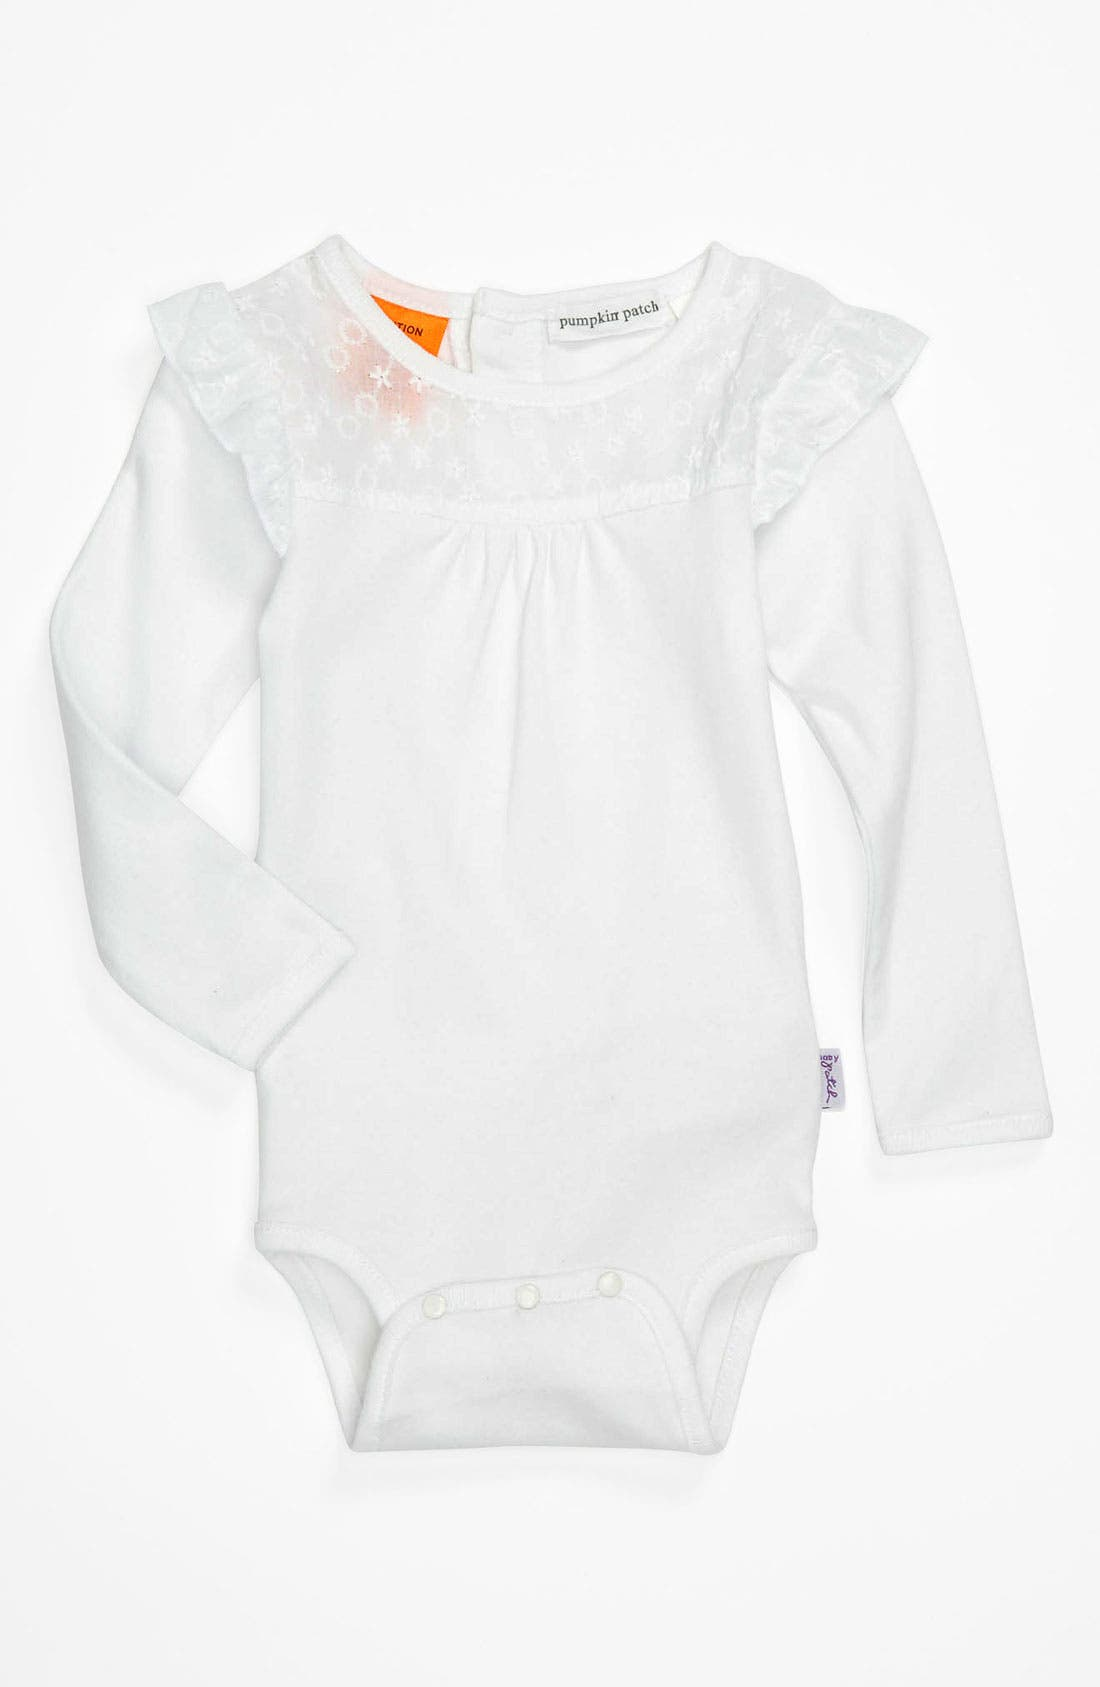 Alternate Image 1 Selected - Pumpkin Patch 'Flutter & Lace' Long Sleeve Bodysuit (Infant)